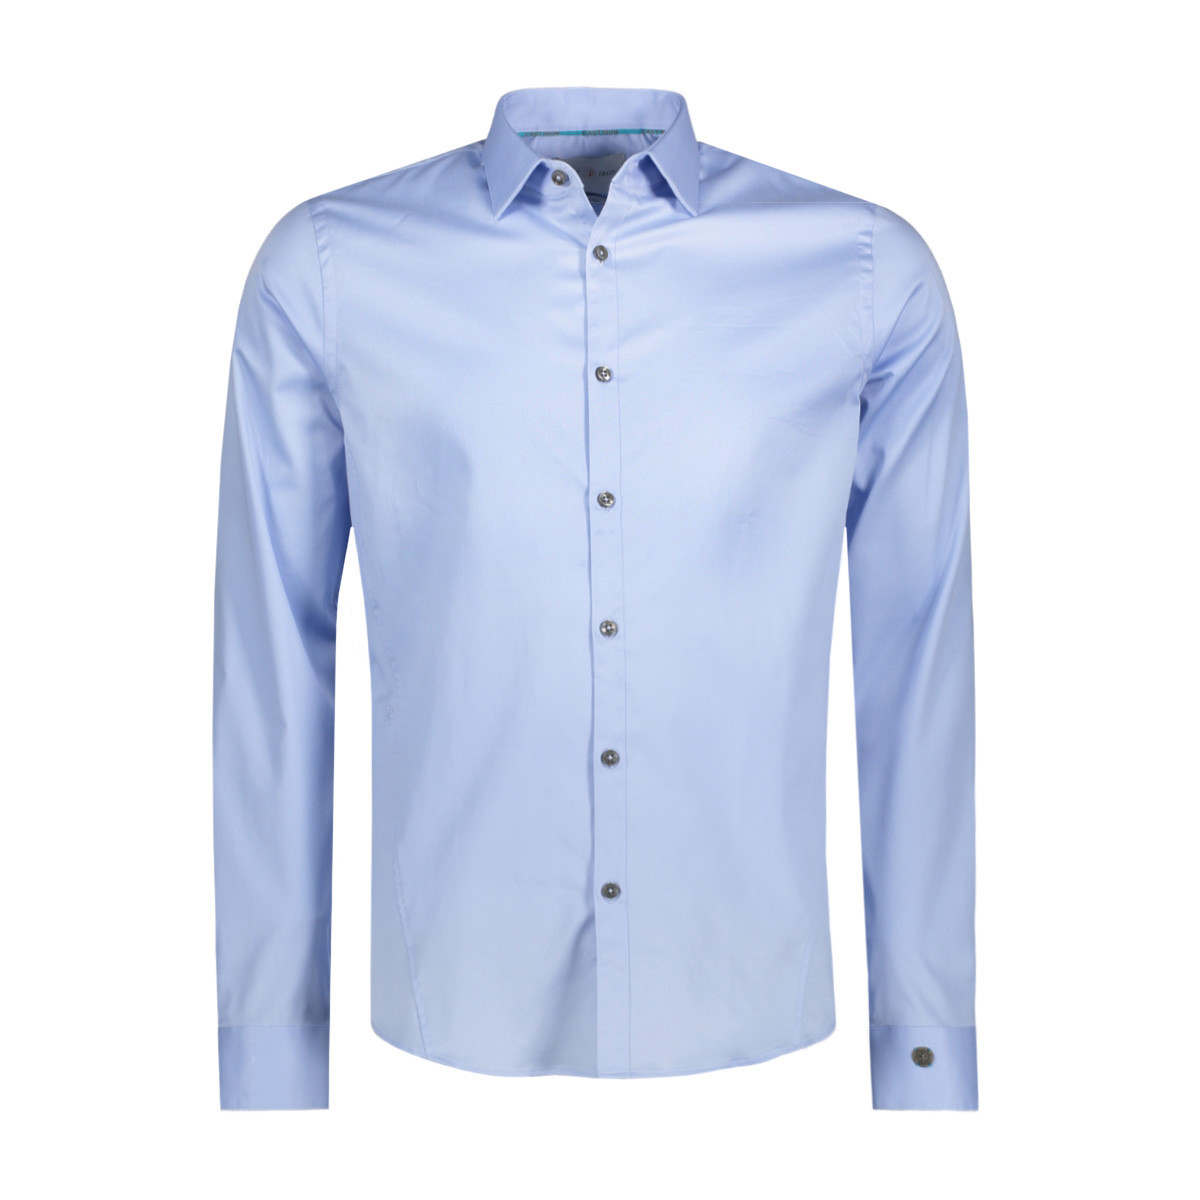 cobra shirt csi00429 cast iron overhemd 5316